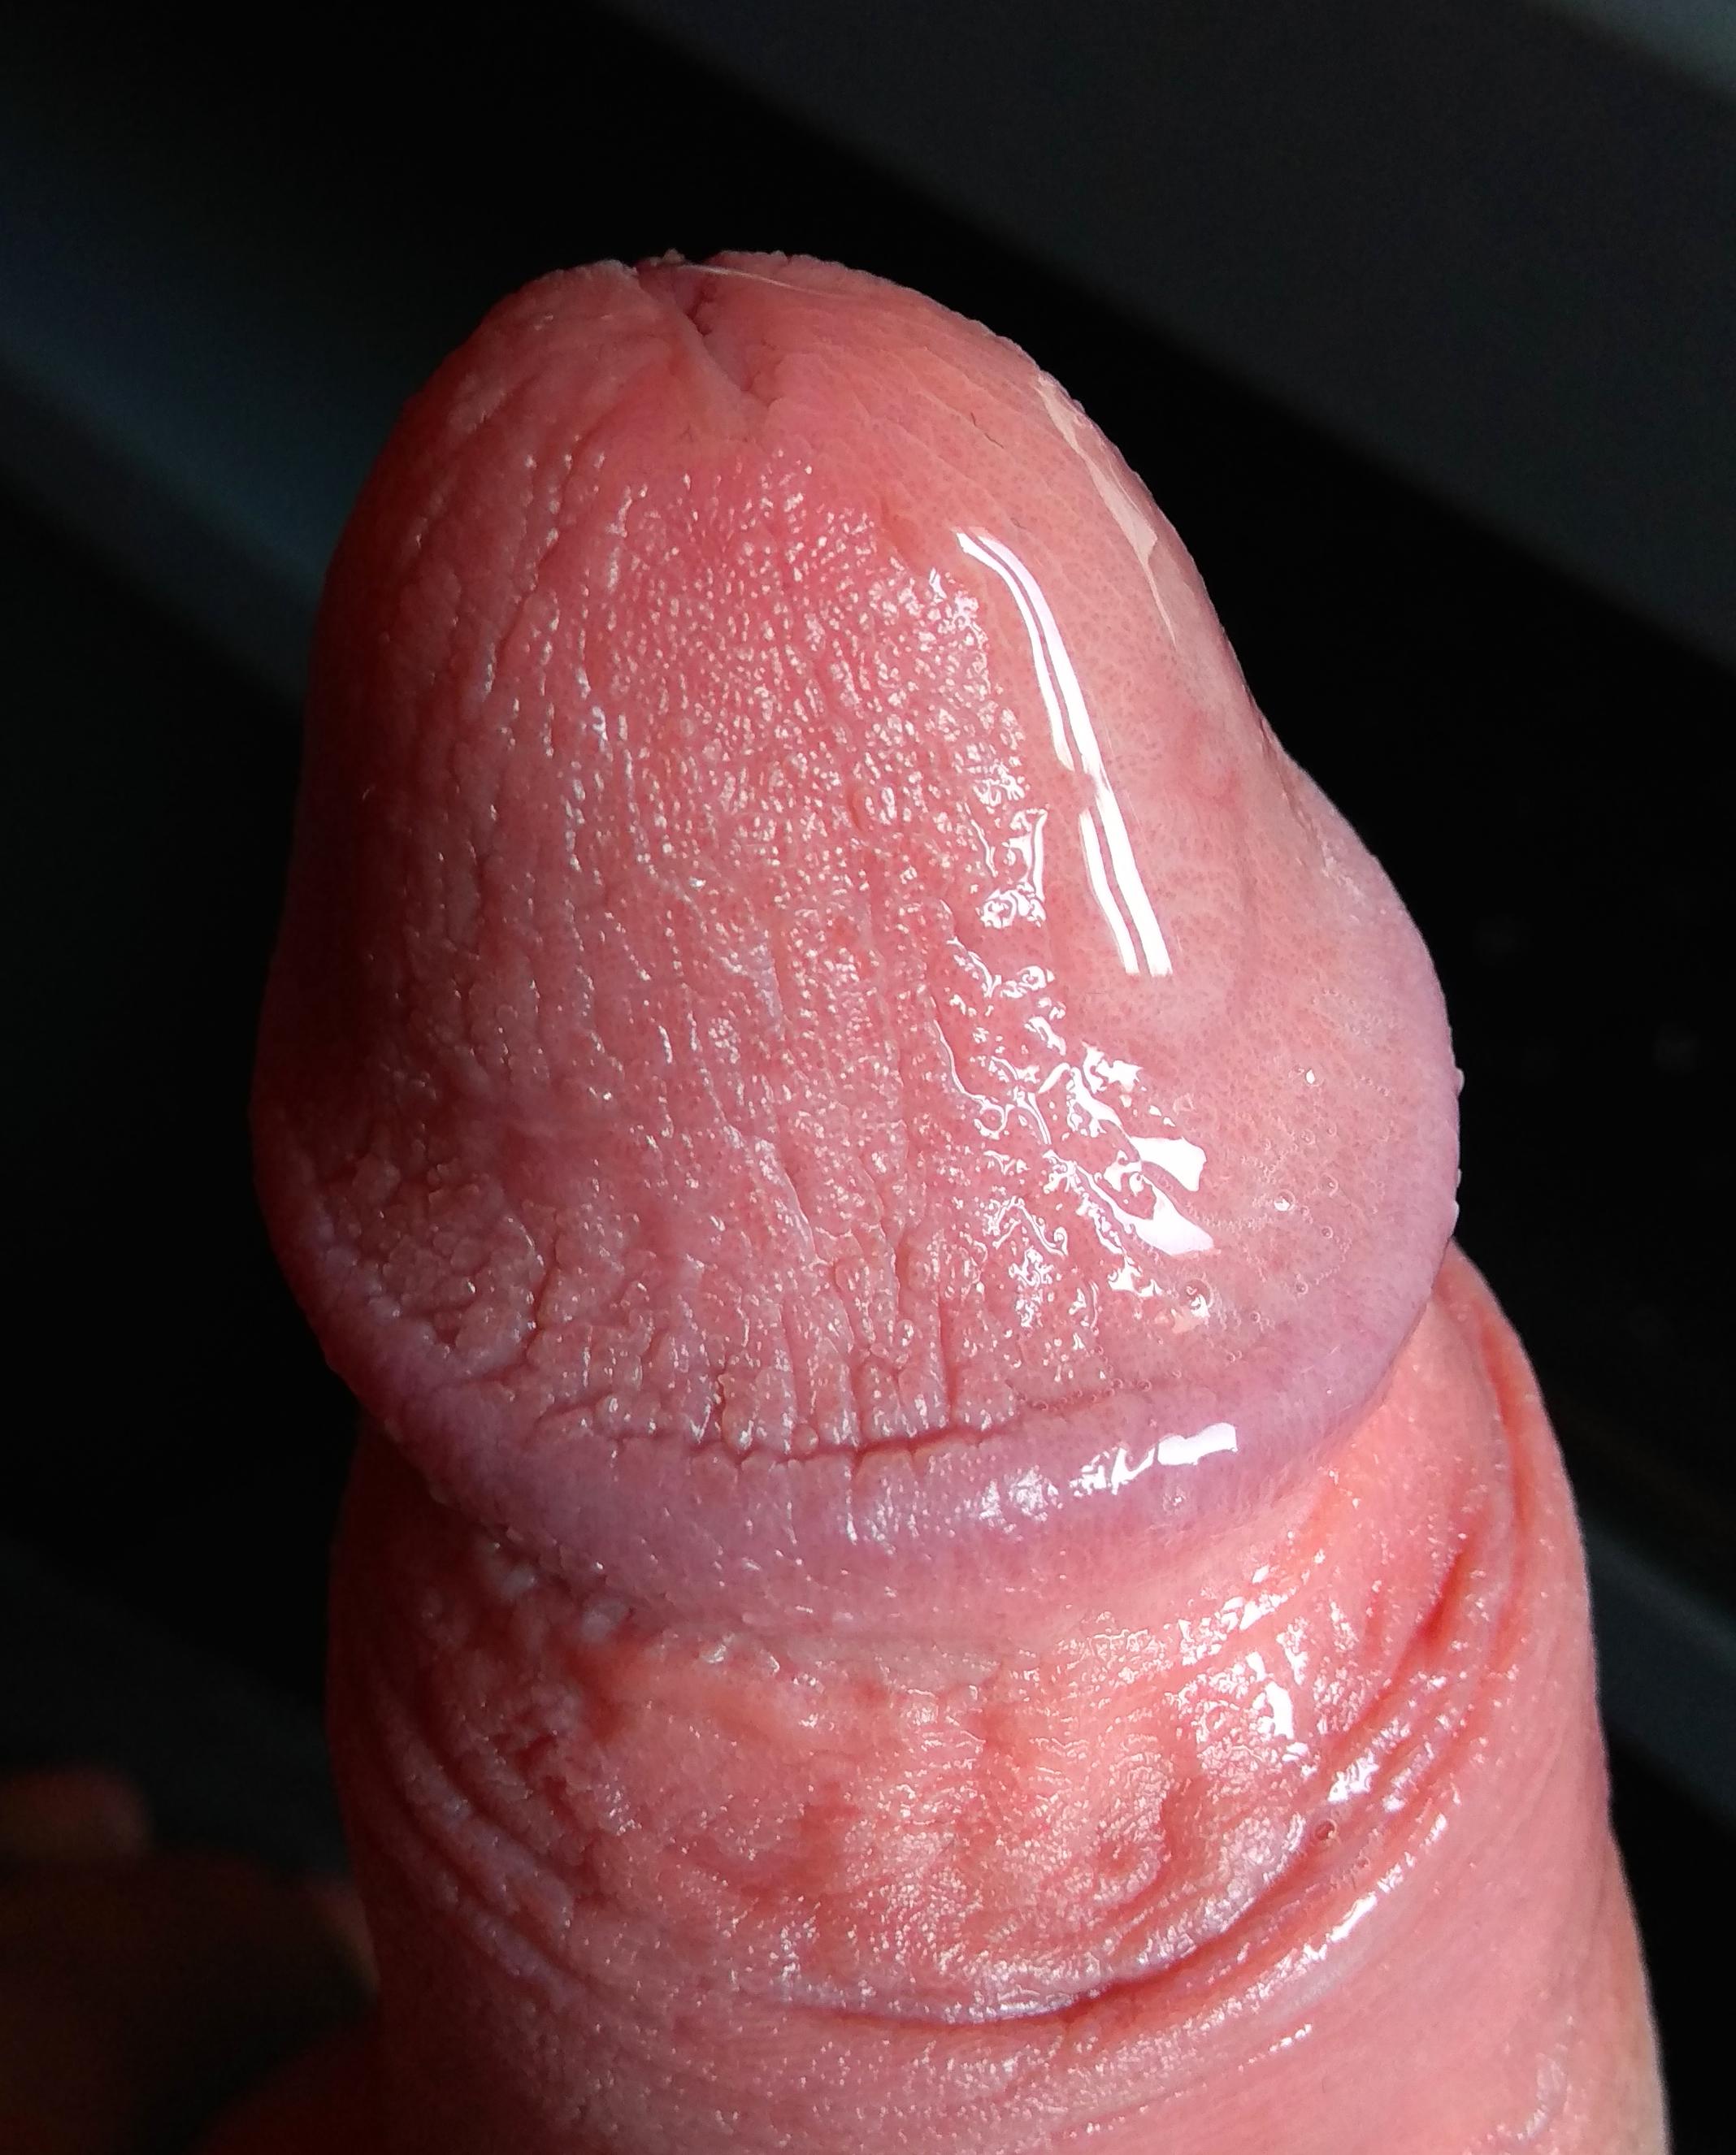 pénisz erekció fotó)